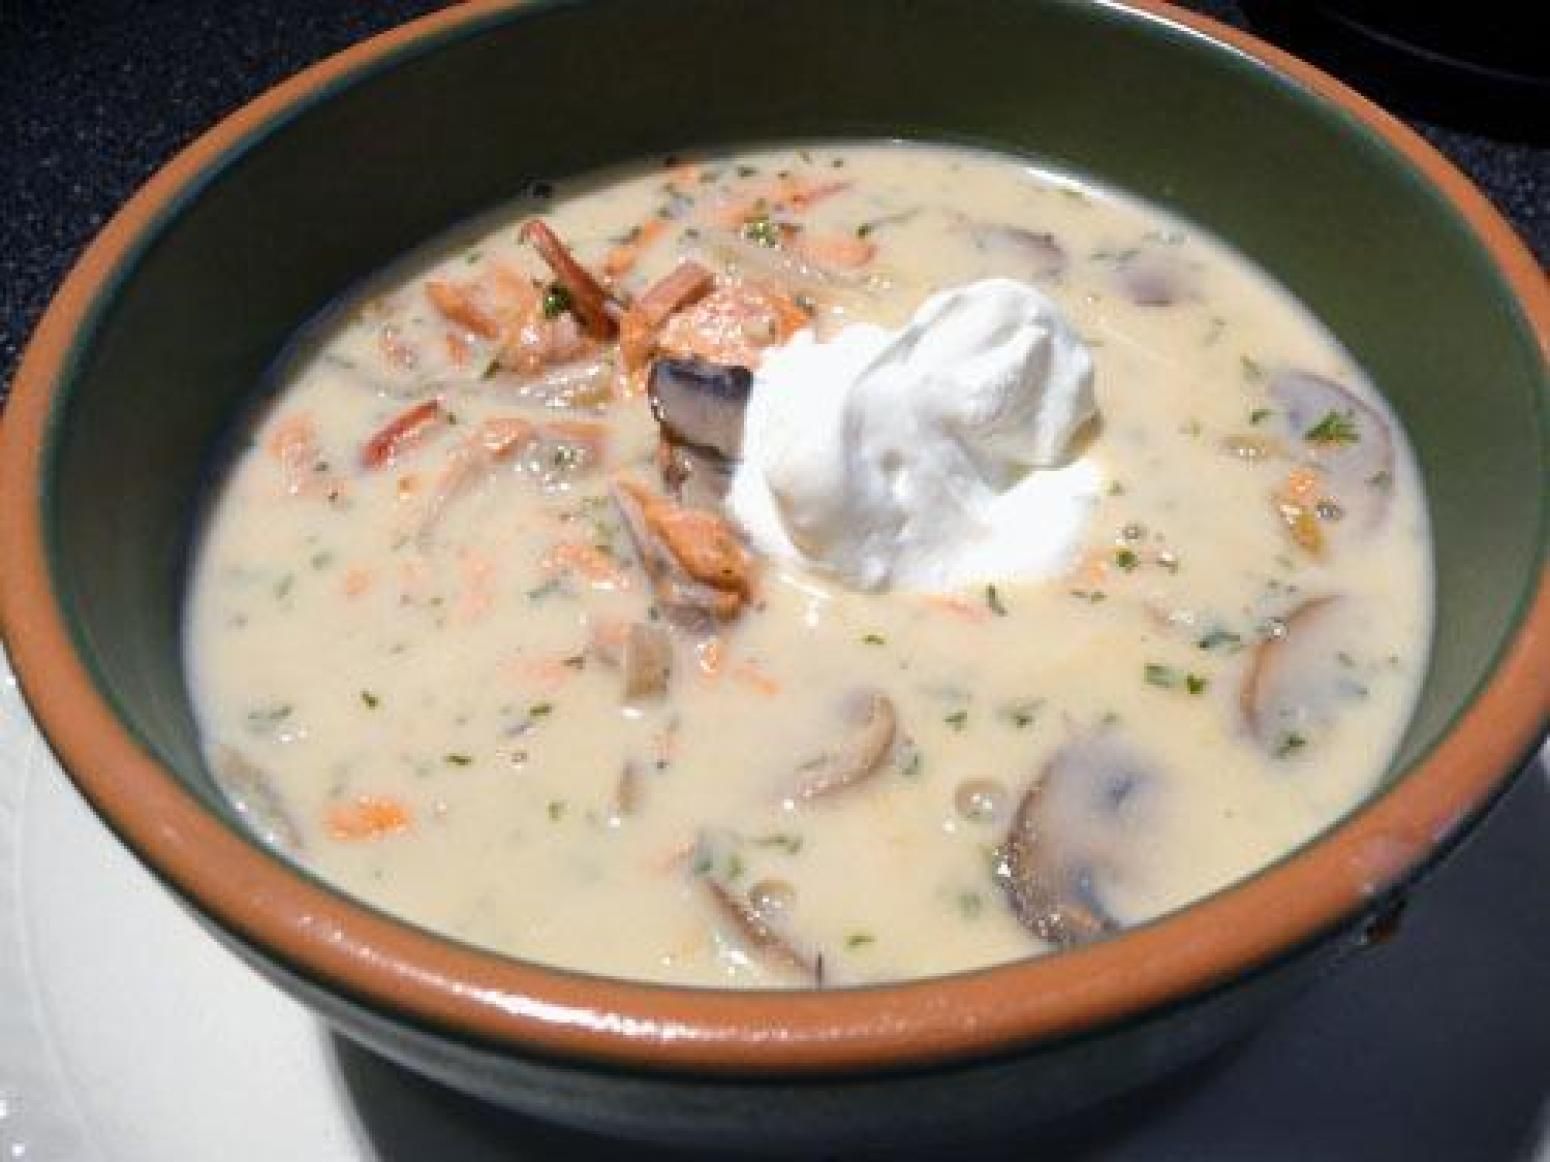 Smoked Salmon Chowder Recipe | Just A Pinch Recipes